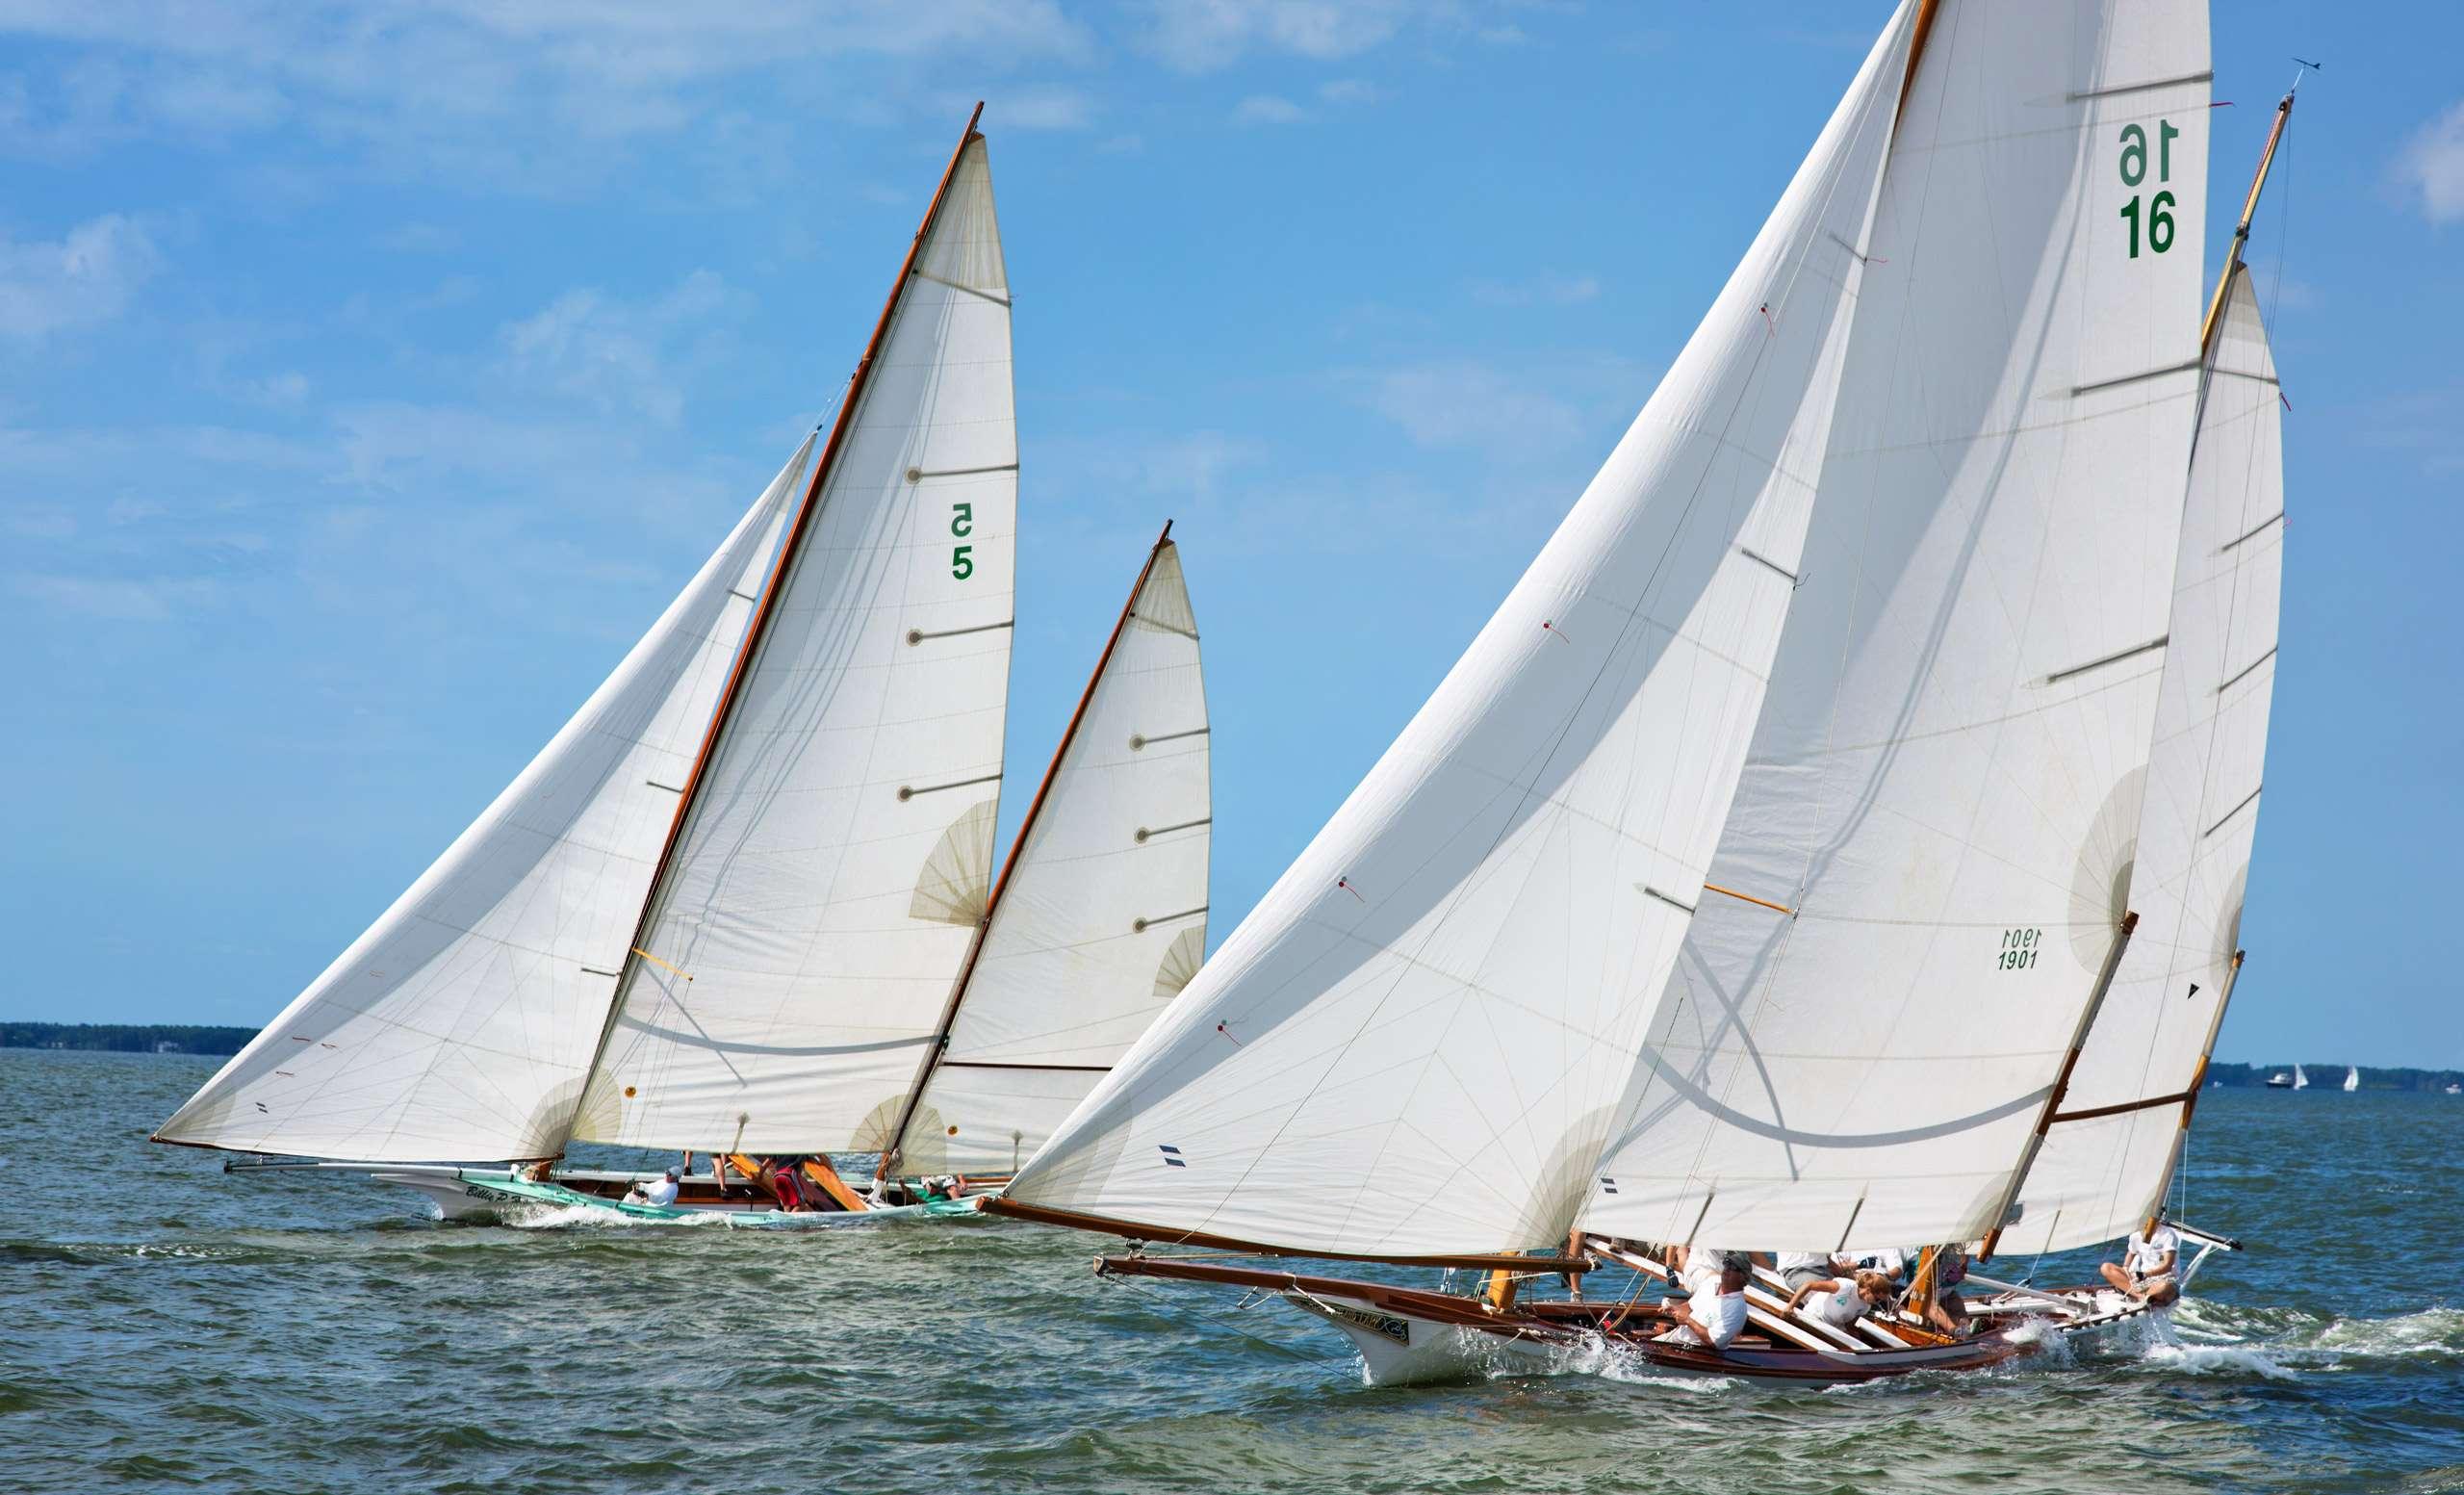 PORTFOLIO - Sailing - Log Canoes #7    PCG530